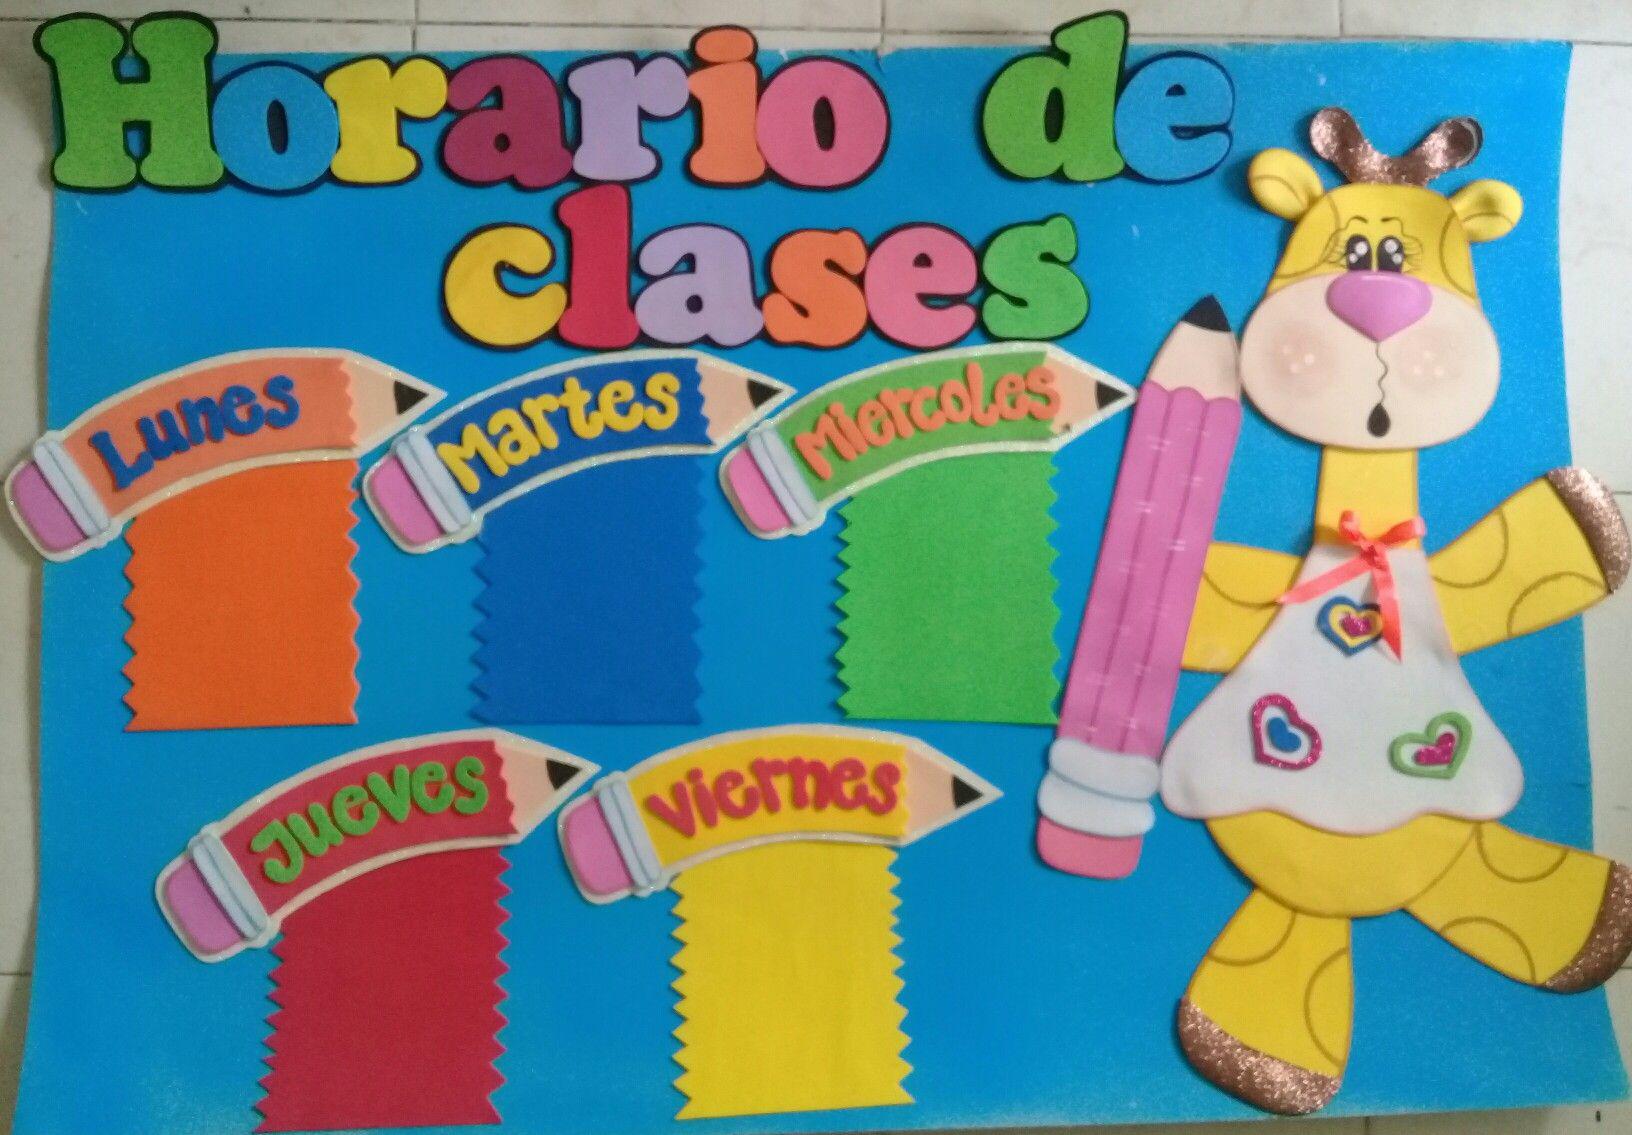 Horario De Clases En Foamy Horario De Clases Decoracion Aula De Preescolar Decorar Salones De Clases